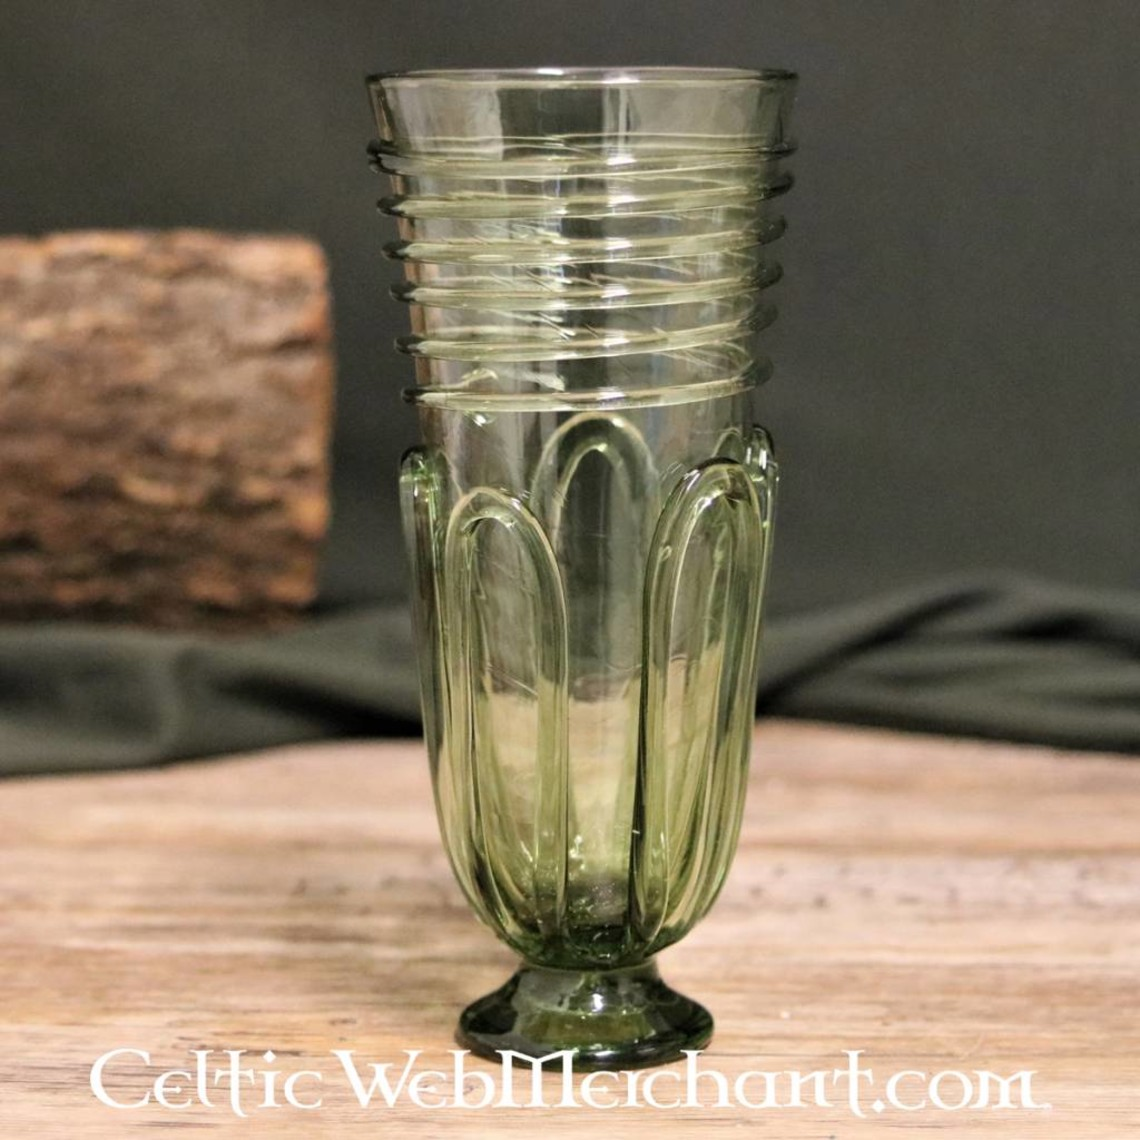 Gotland glas, 5de-6de eeuw